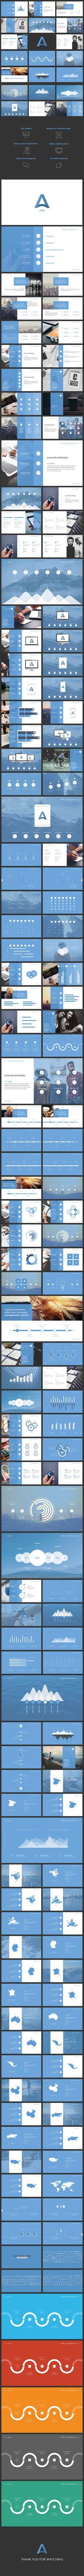 Alpha Powerpoint Template. Download here: http://graphicriver.net/item/alpha-powerpoint/15927272?ref=ksioks